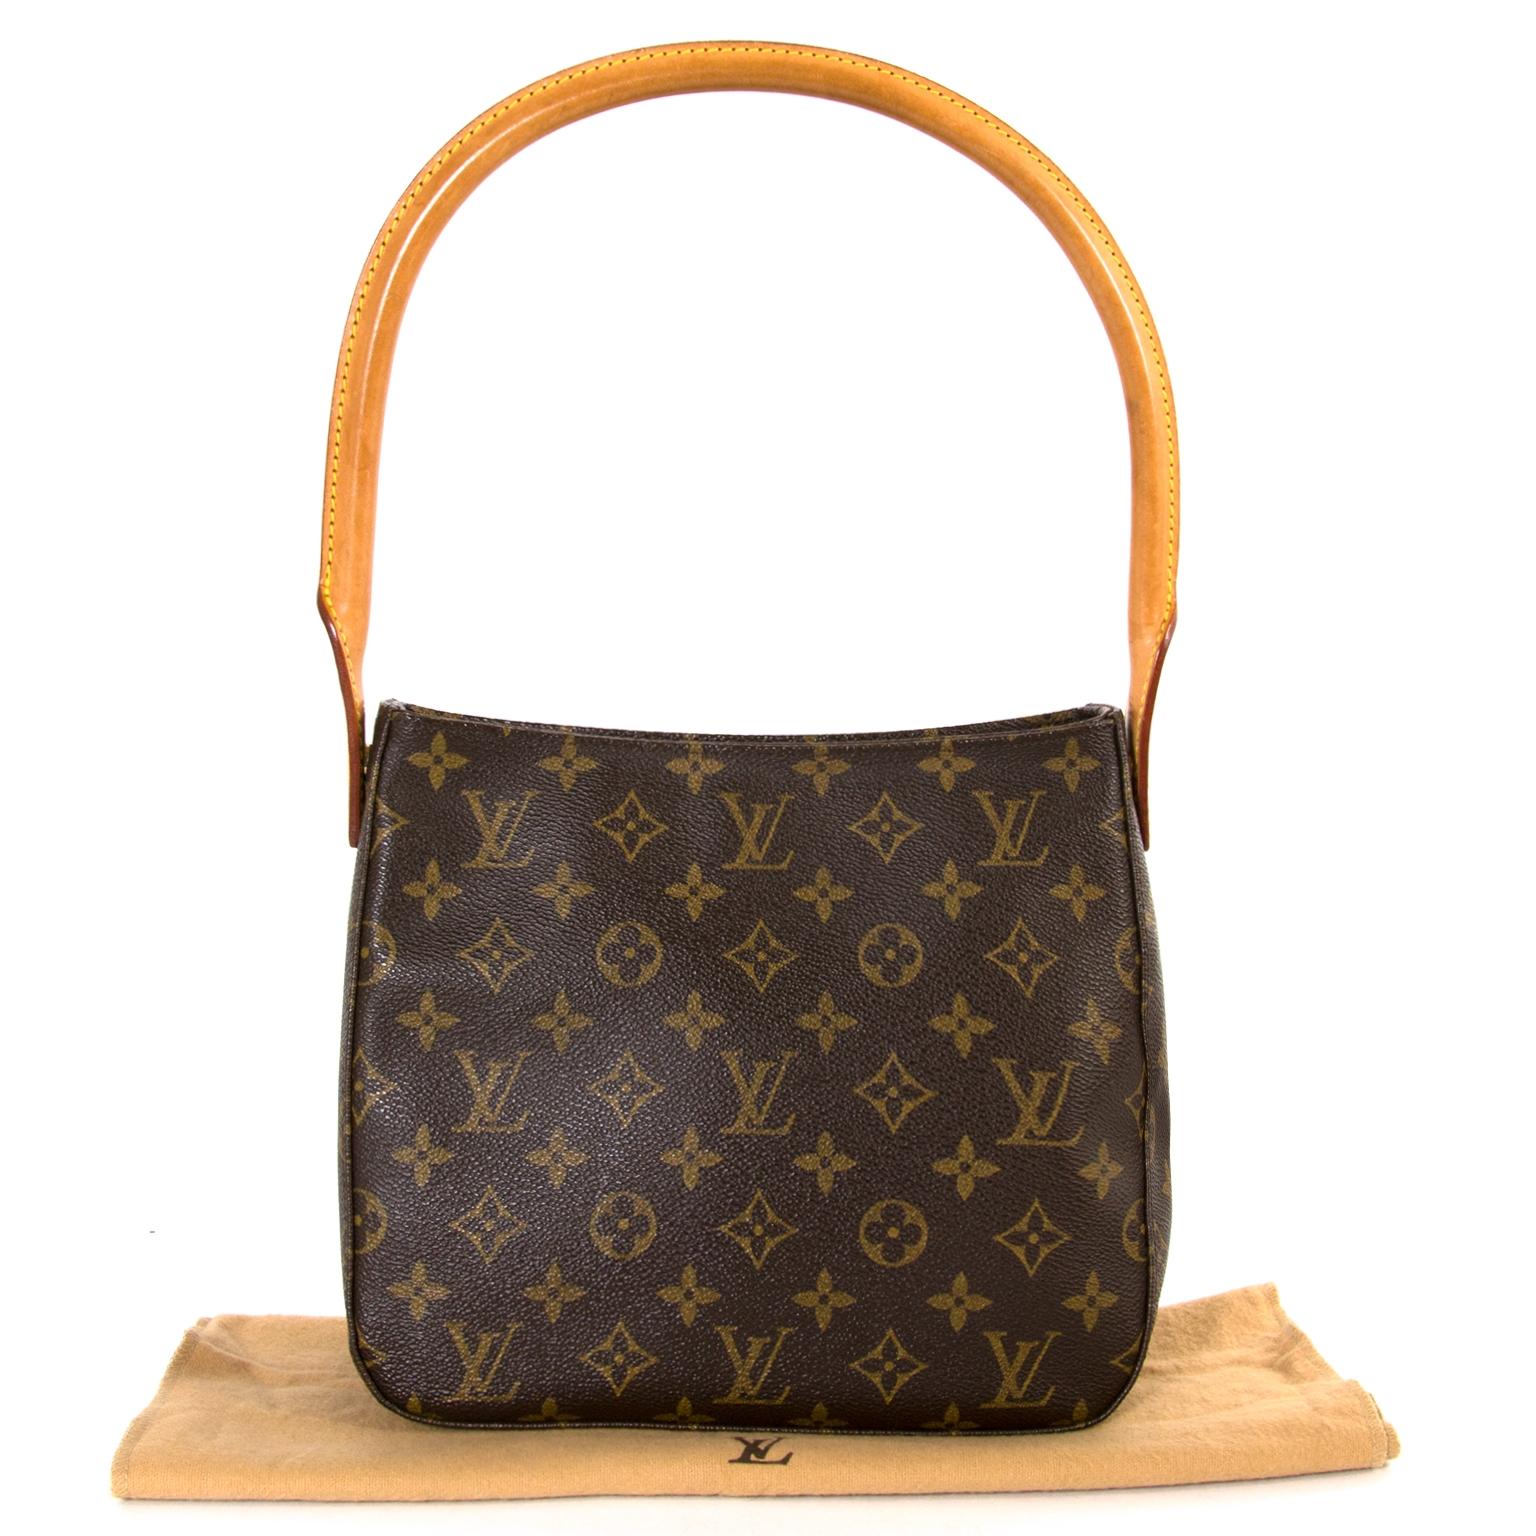 Louis Vuitton Looping Monogram Shoulder Bag now for sale at labellov vintage fashion webshop belgium